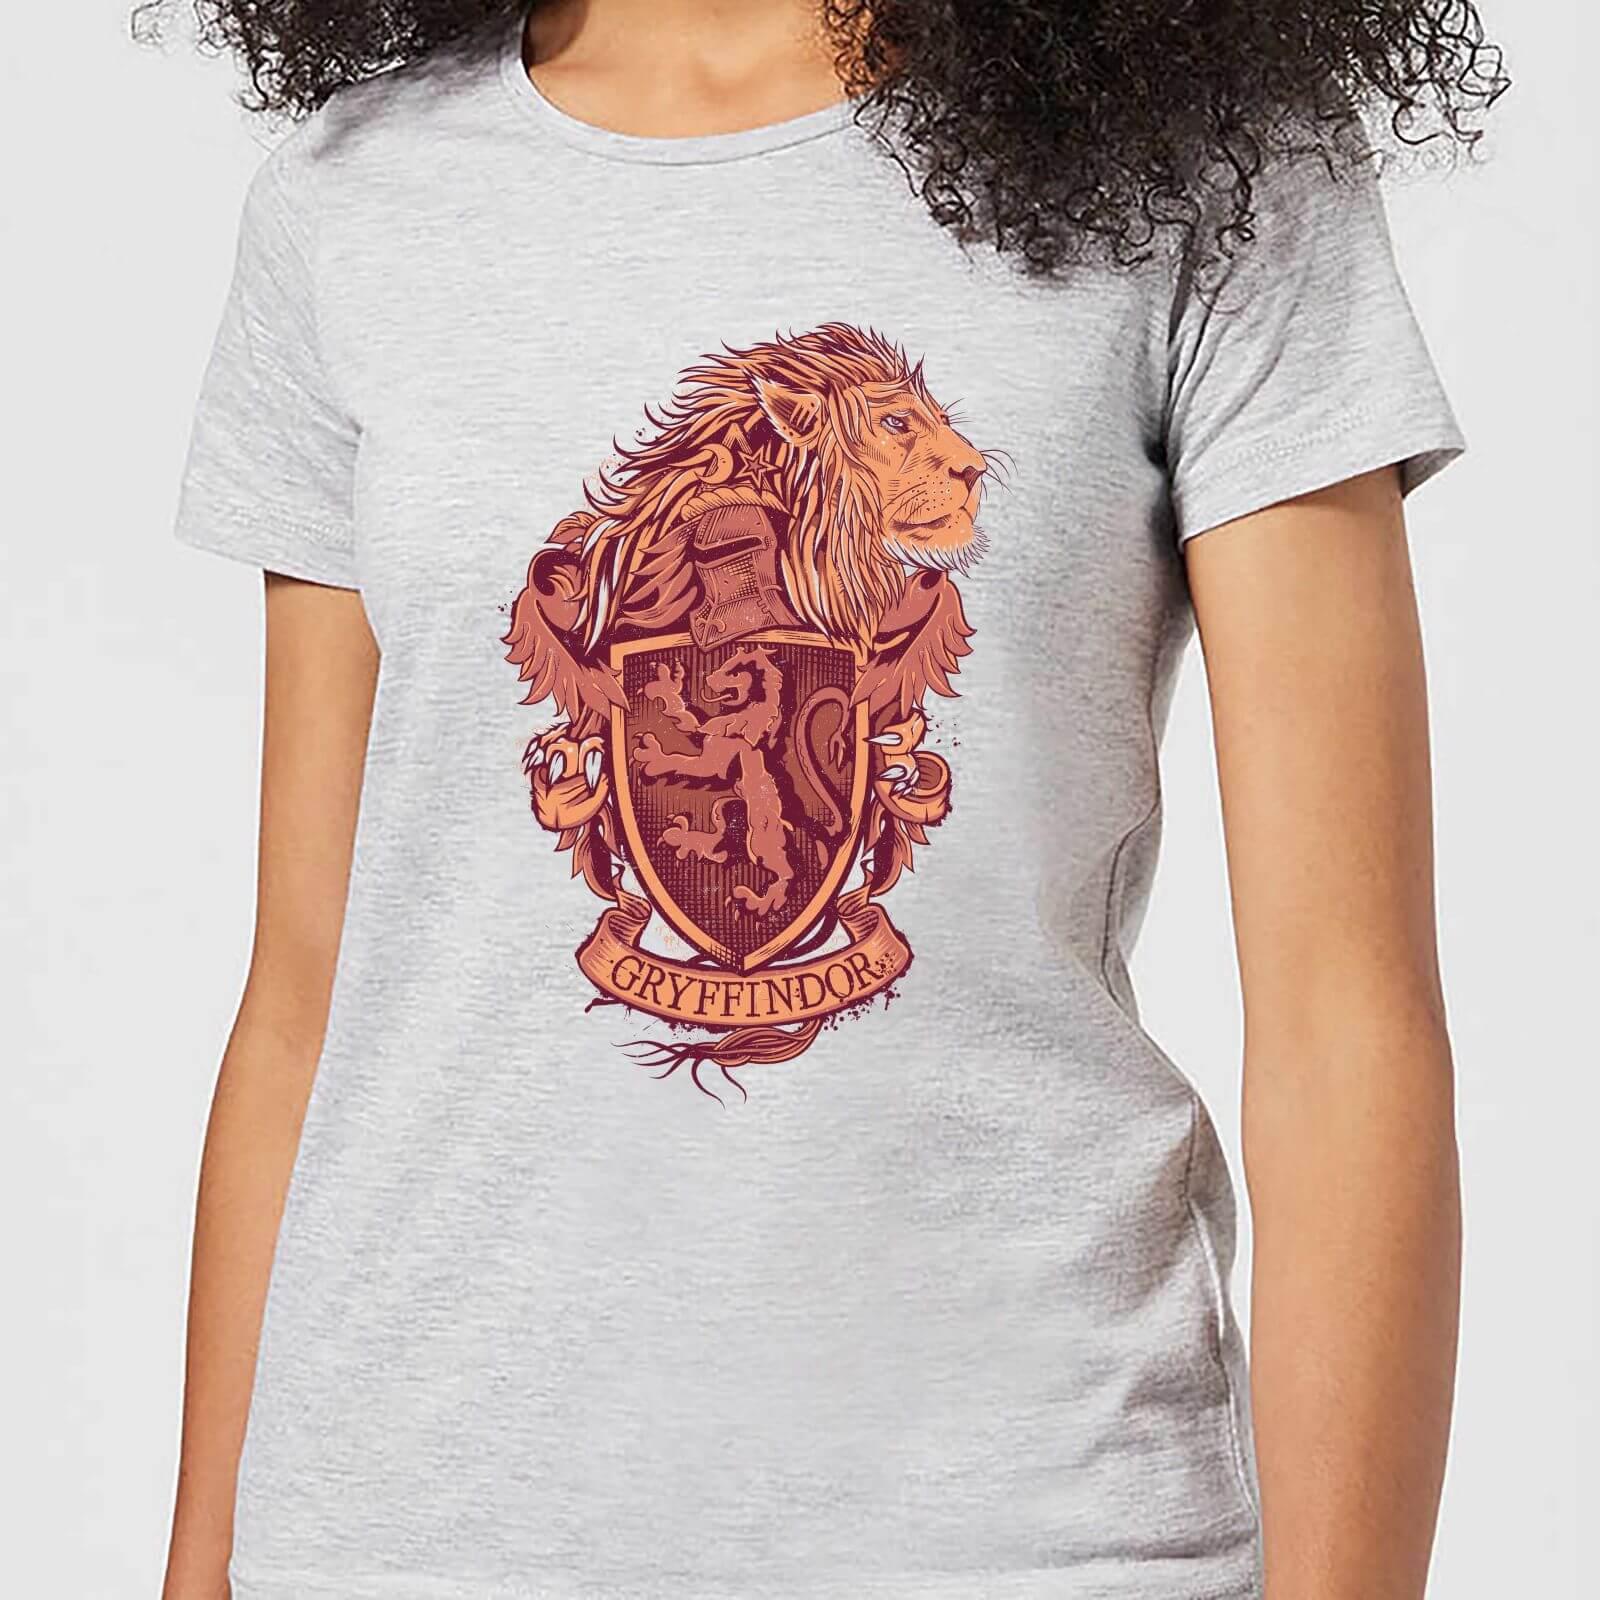 Harry Potter Gryffindor Drawn Crest Women's T-Shirt - Grey - S - Gris